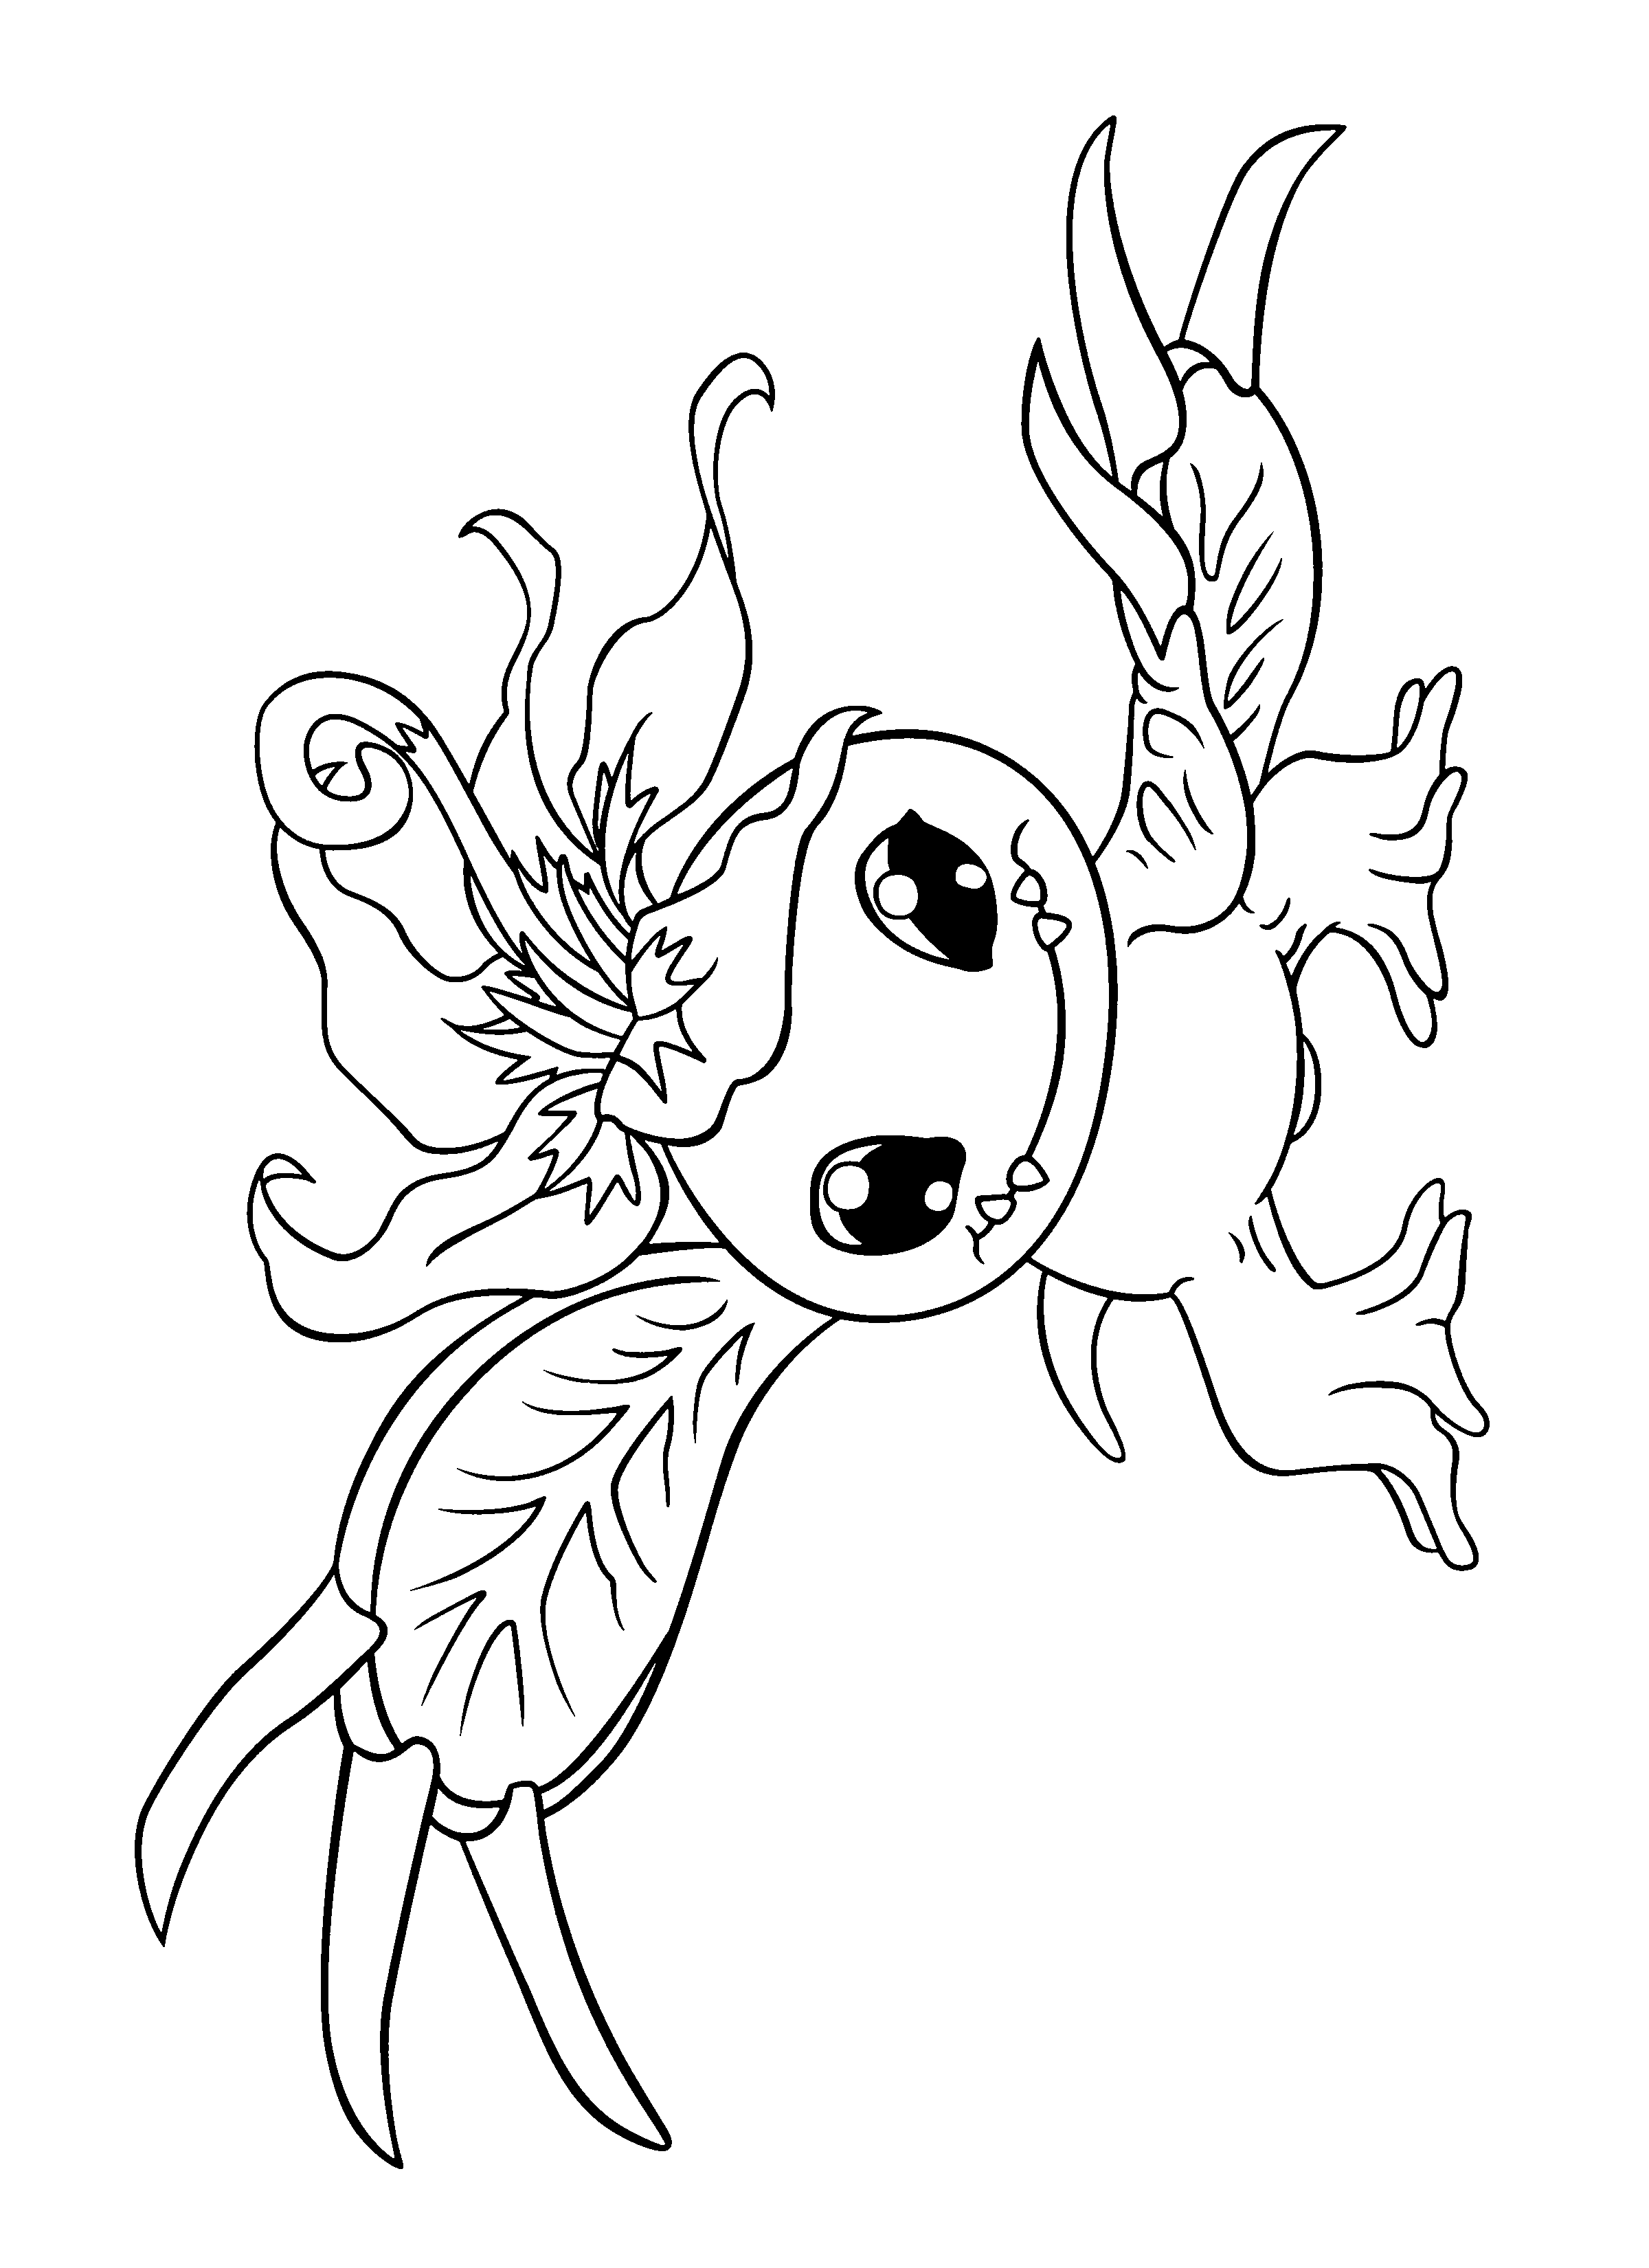 Digimon Coloring Pages Coloring Page Digimon Coloring